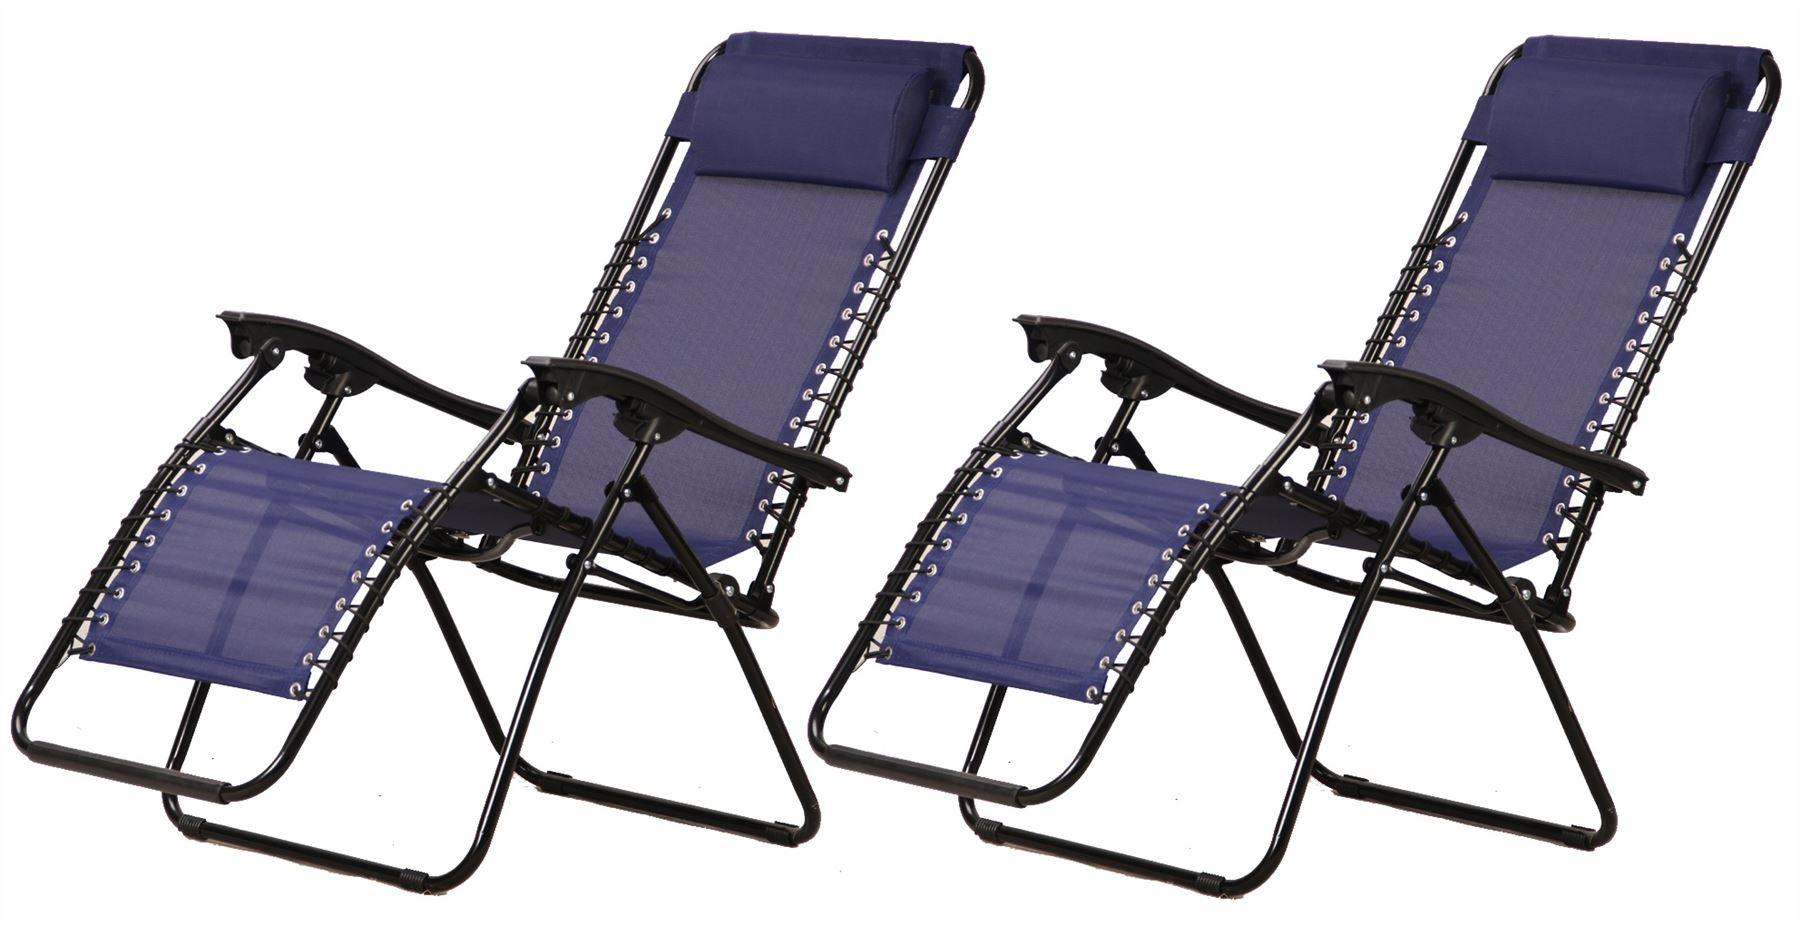 Set-of-2-Vinsani-Textoline-Gravity-Reclining-Garden-  sc 1 st  eBay & Set of 2 - Vinsani Textoline Gravity Reclining Garden Chairs In ... islam-shia.org